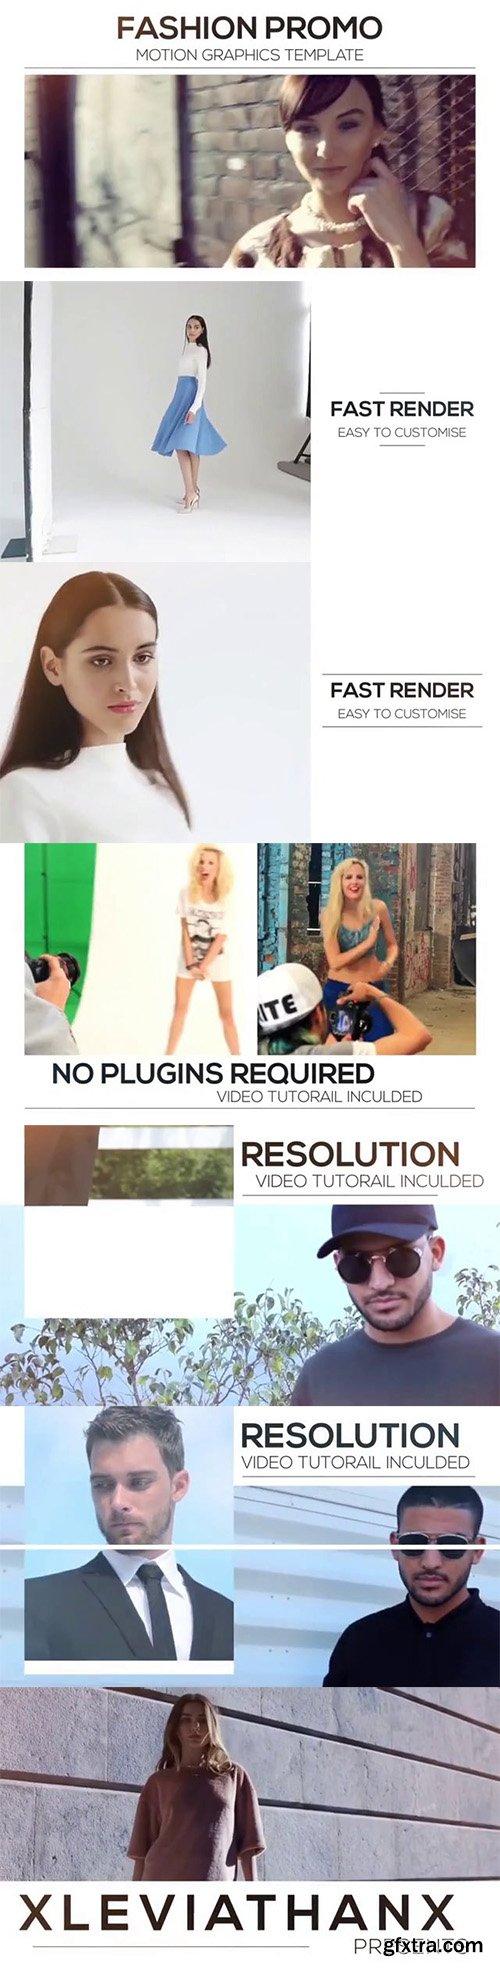 Pond5 - Fashion Promo Slideshow Movie Trailer And Titles Displays Photo Gallery 065508923